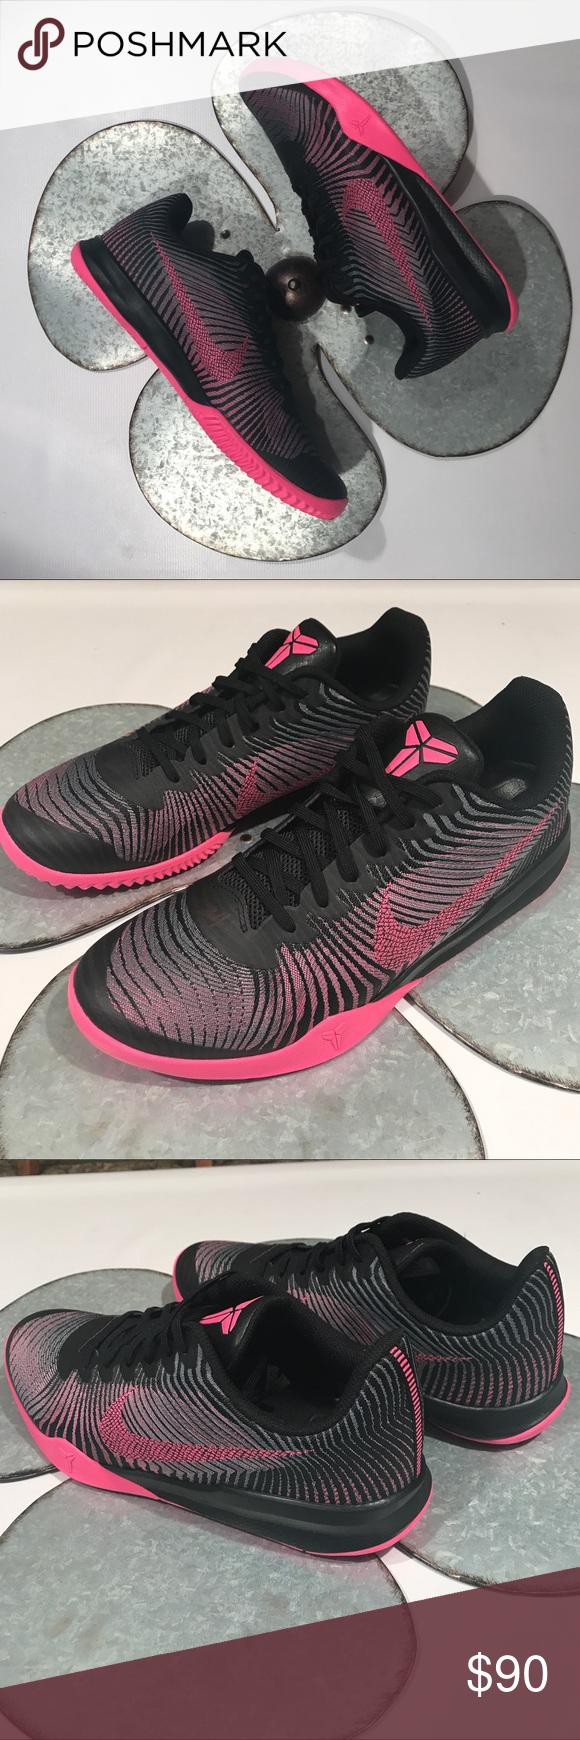 Nike Kobe Mentality 2 New Size 10 Pink